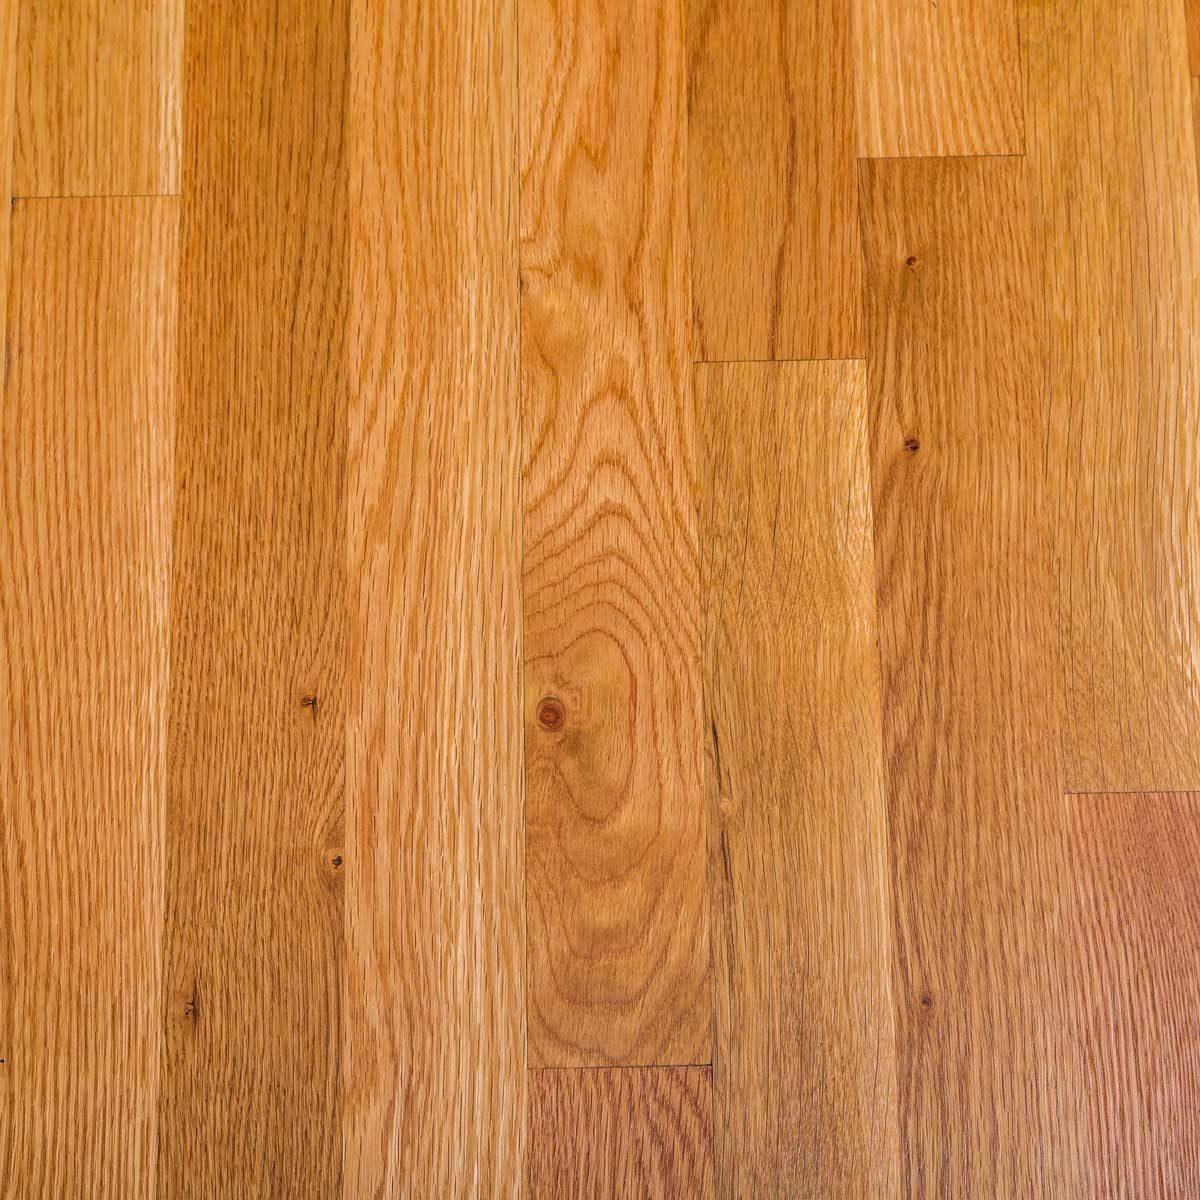 shiny polished hardwood floor